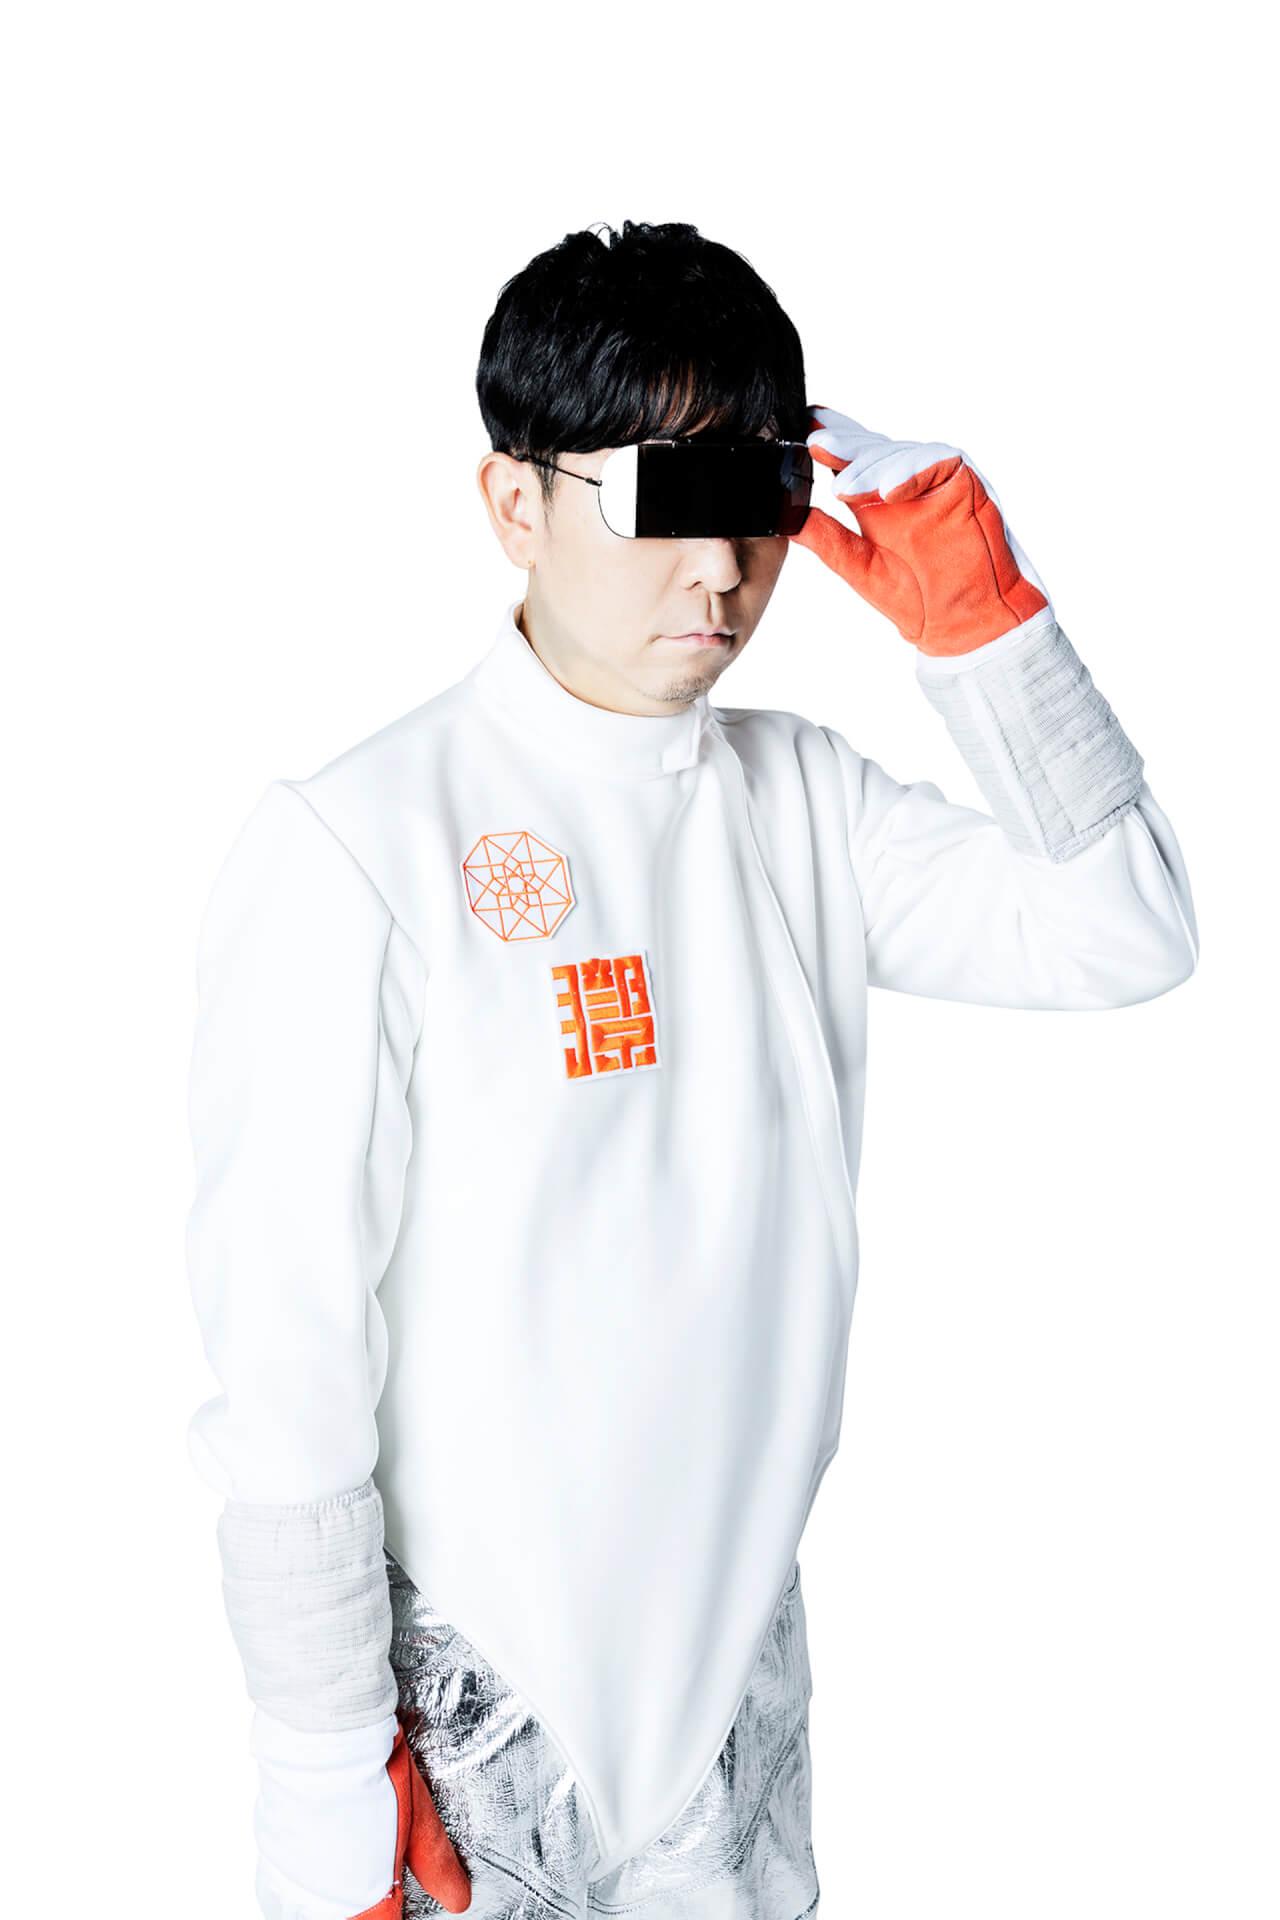 J-WAVE特別番組で m-flo、OKAMOTO'SがNetflix作品を熱く語る!King Gnu常田大希が『攻殻機動隊 SAC_2045』の魅力を紹介するコーナーも art200428_jwave_7